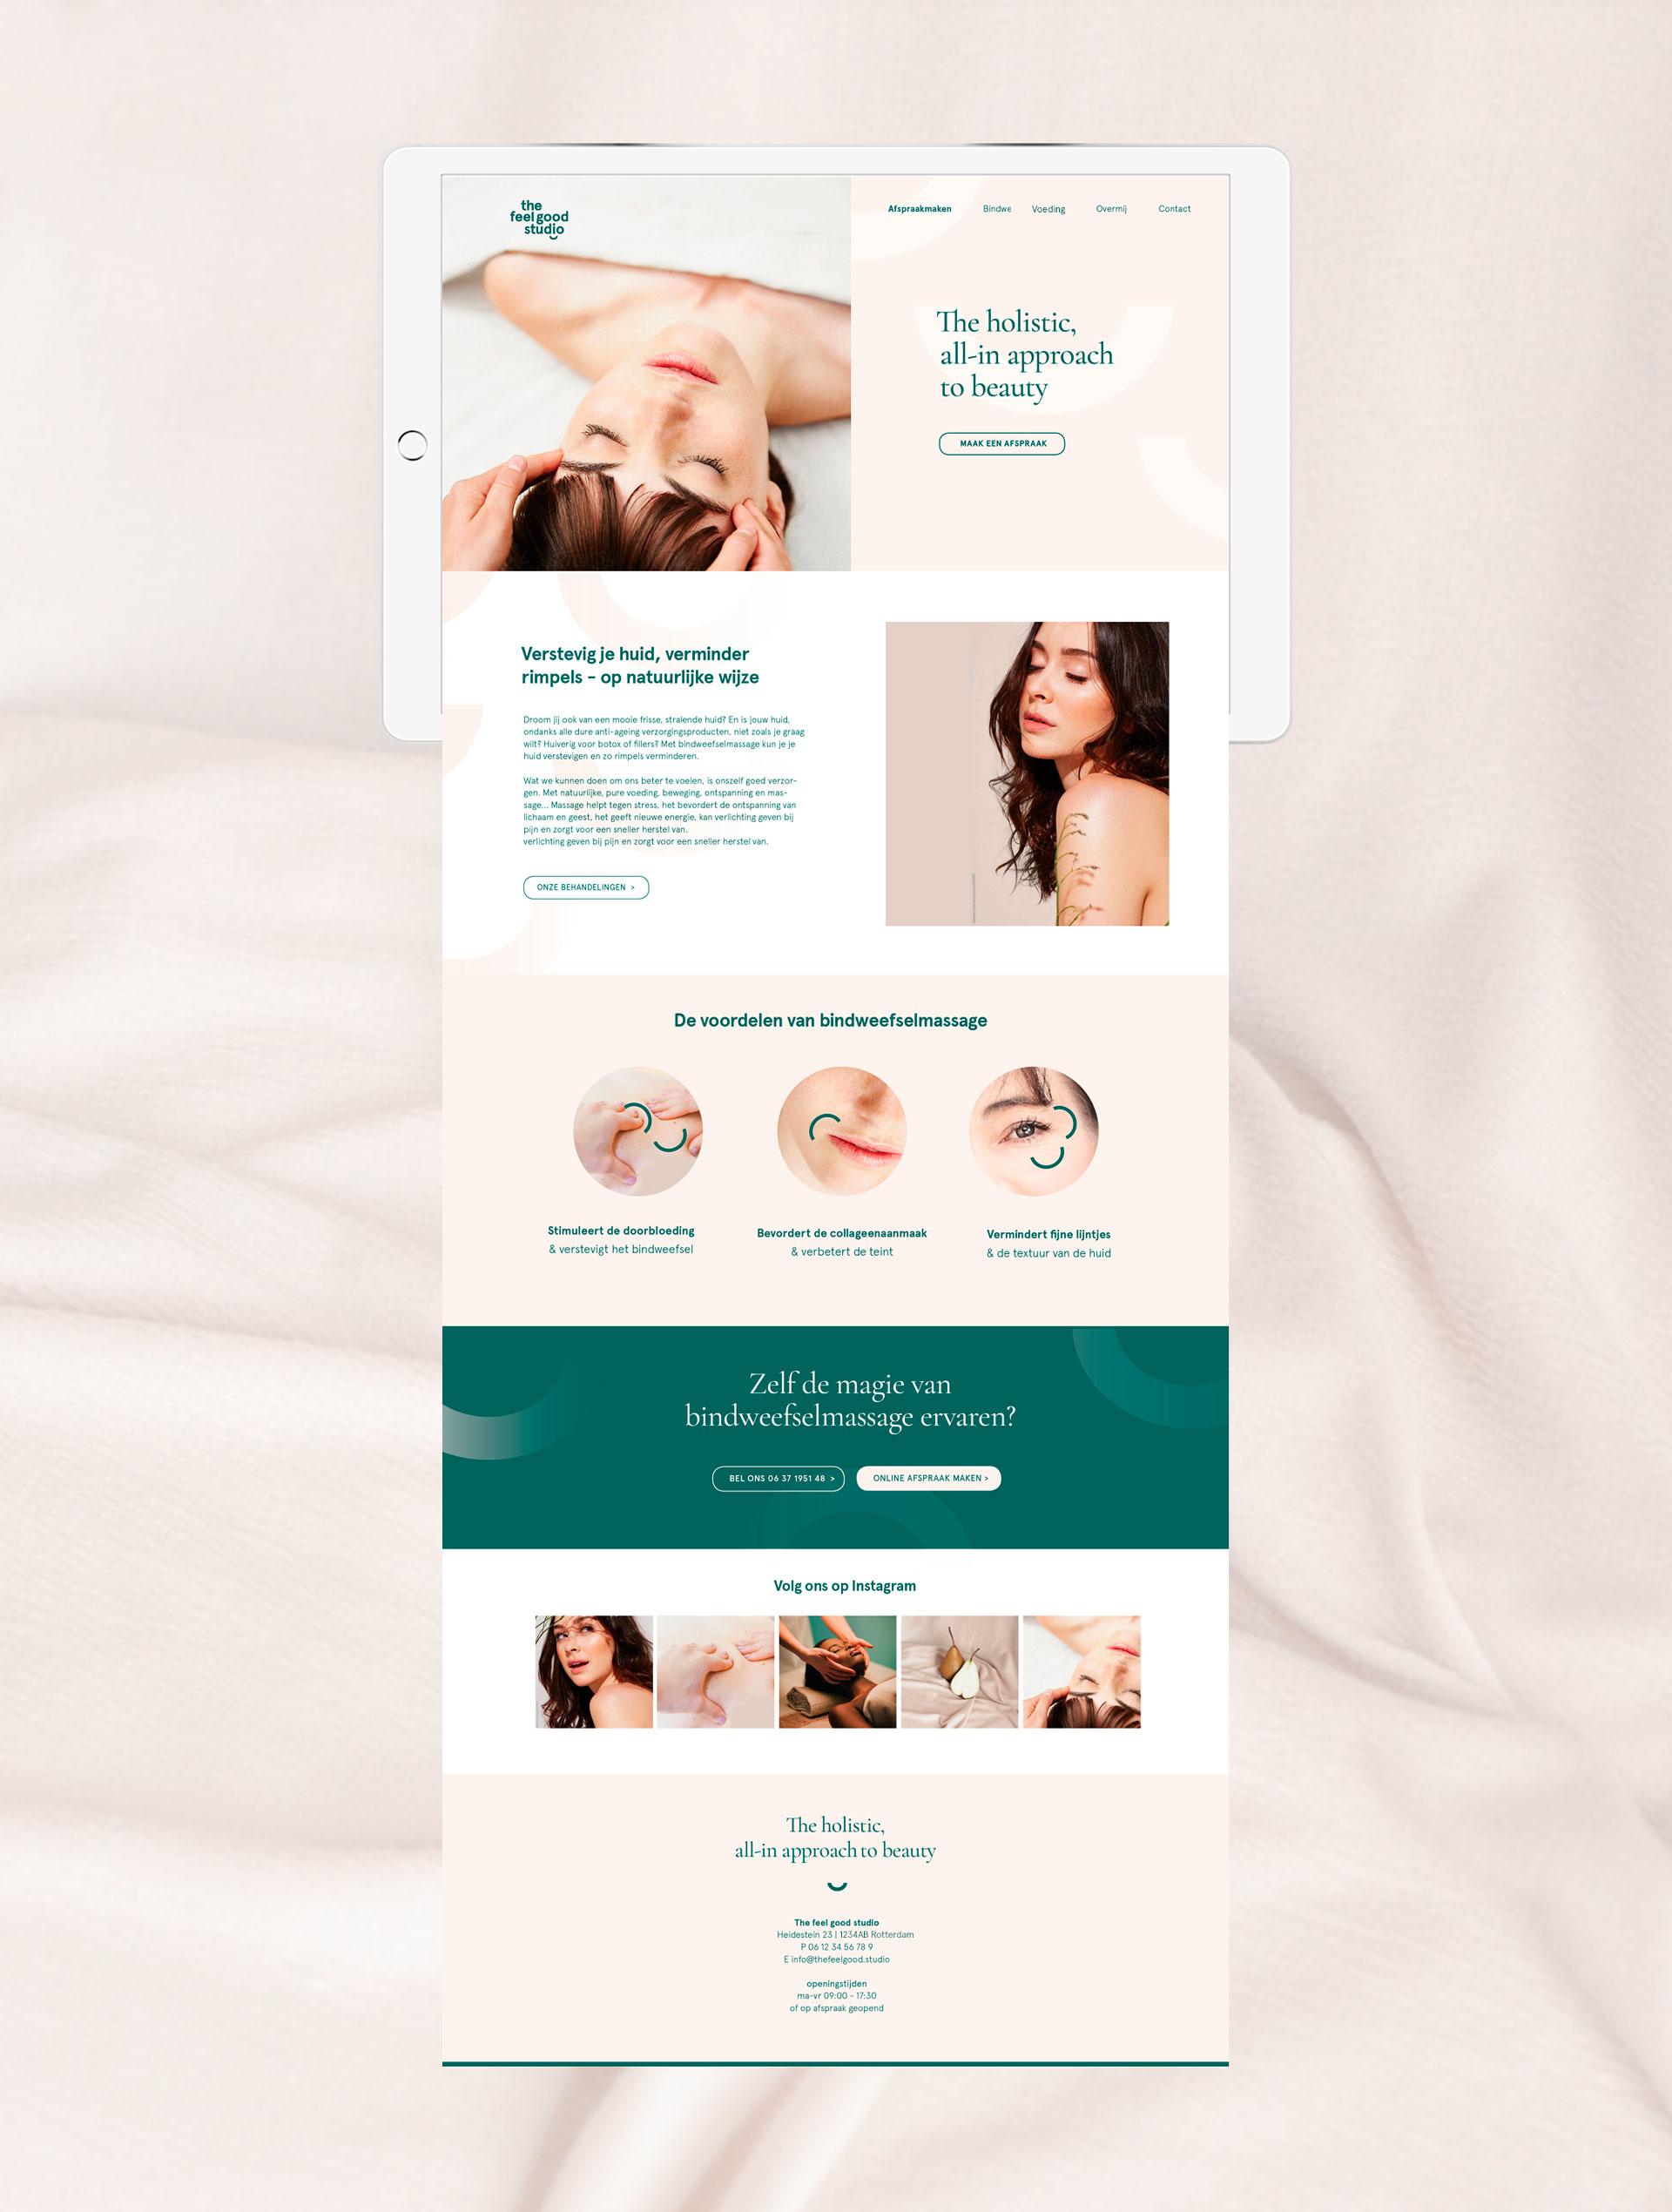 4dfeelgood_massage_studio_identity_website_design_webdesign_leconcepteur_tamarapruis